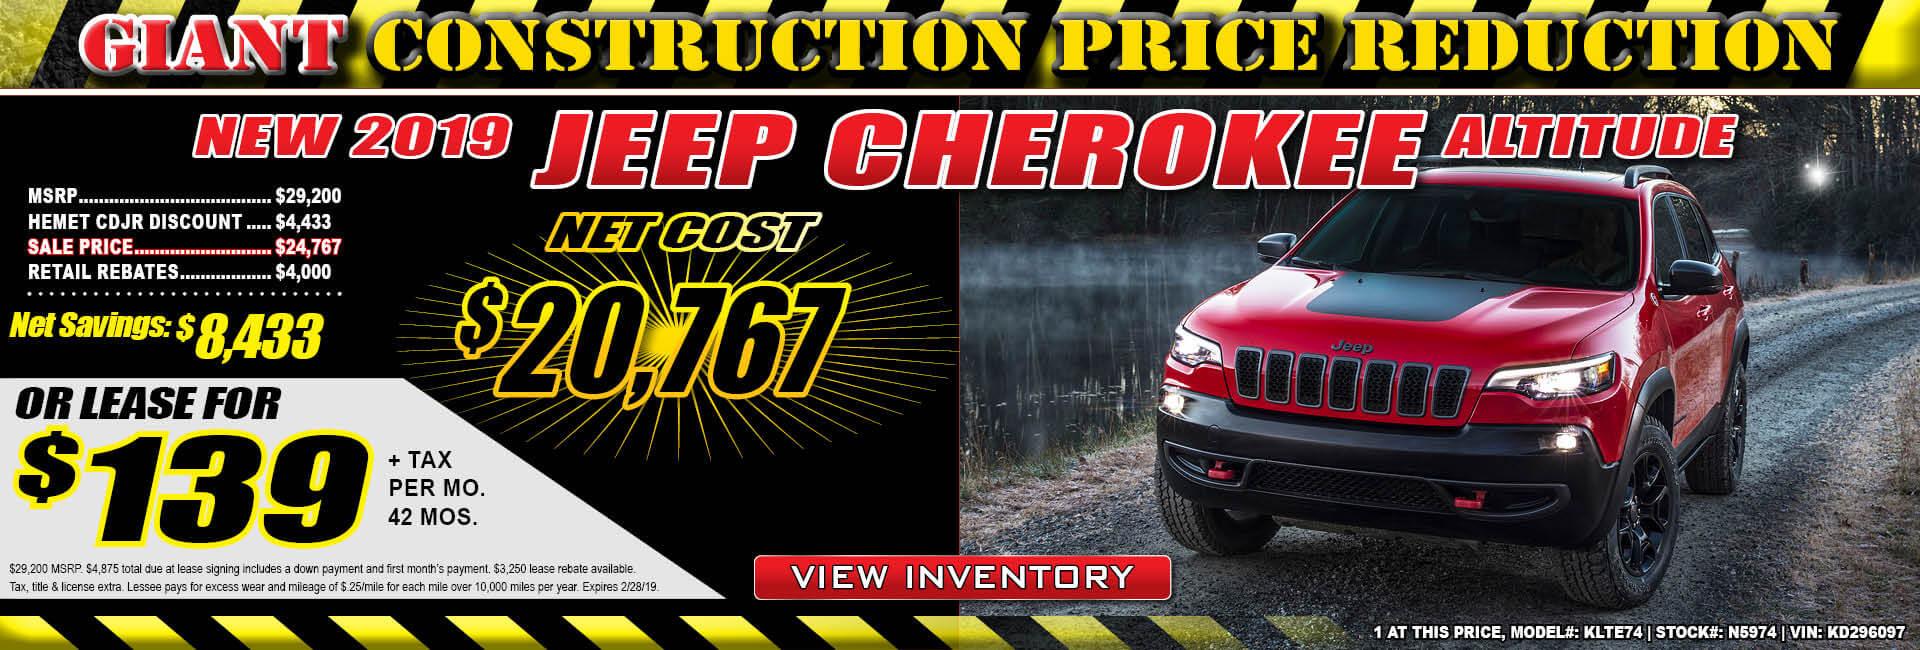 Jeep Cherokee Lease $139